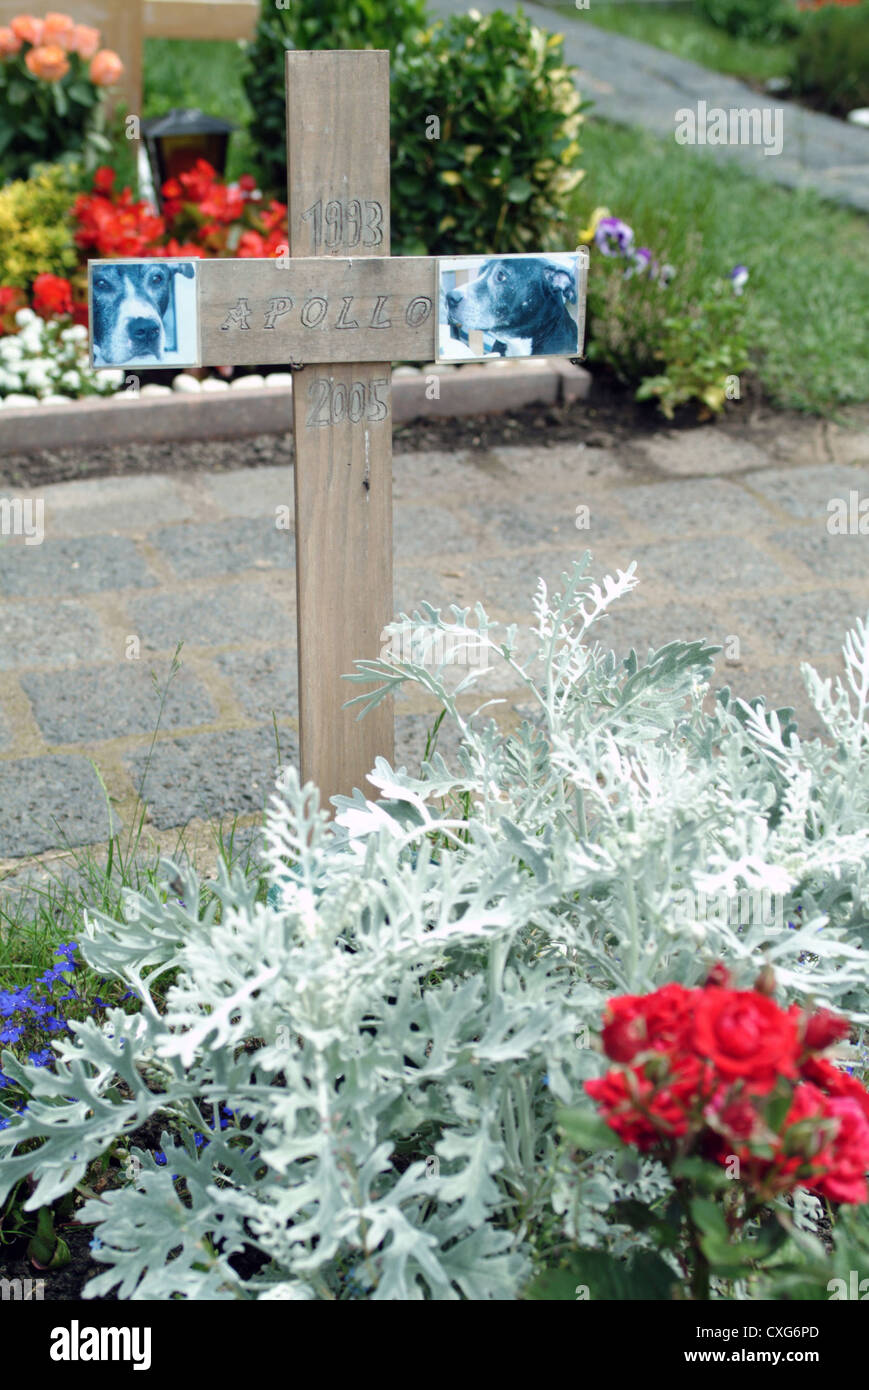 Berlin Hunde Grab In Einem Tierfriedhof Stockfoto Bild 50758357